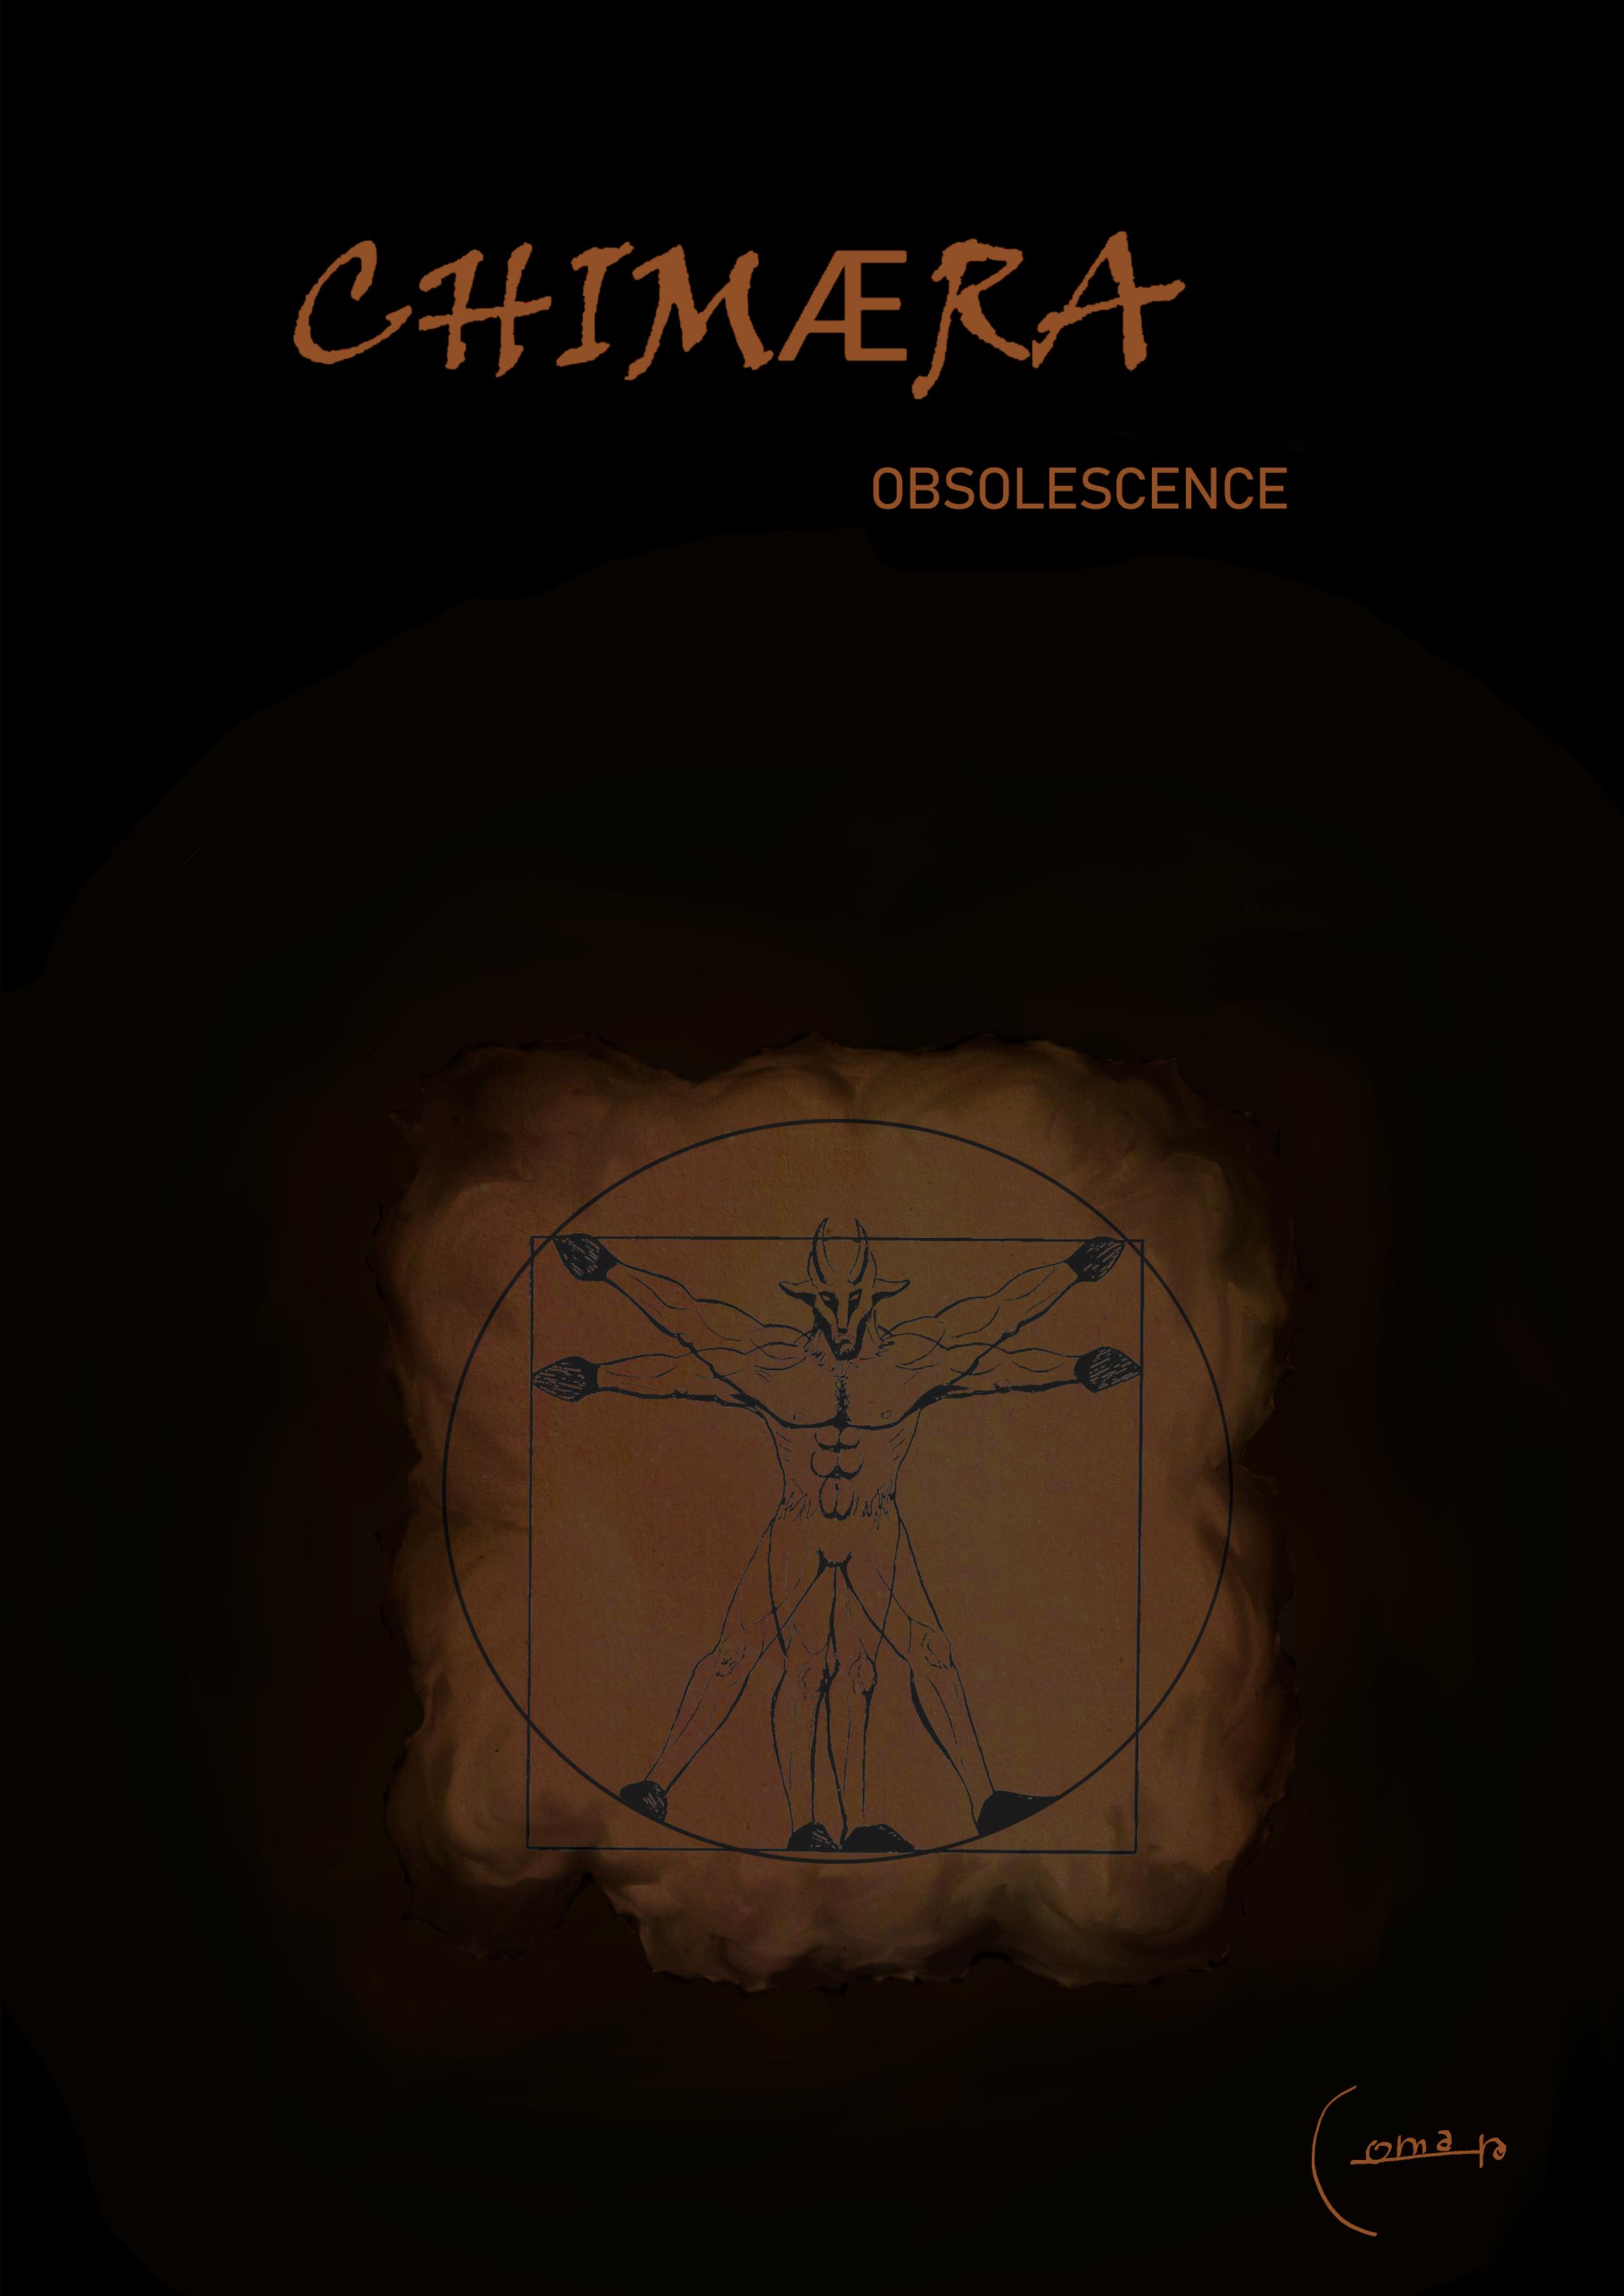 Chimaera - Obsolescence